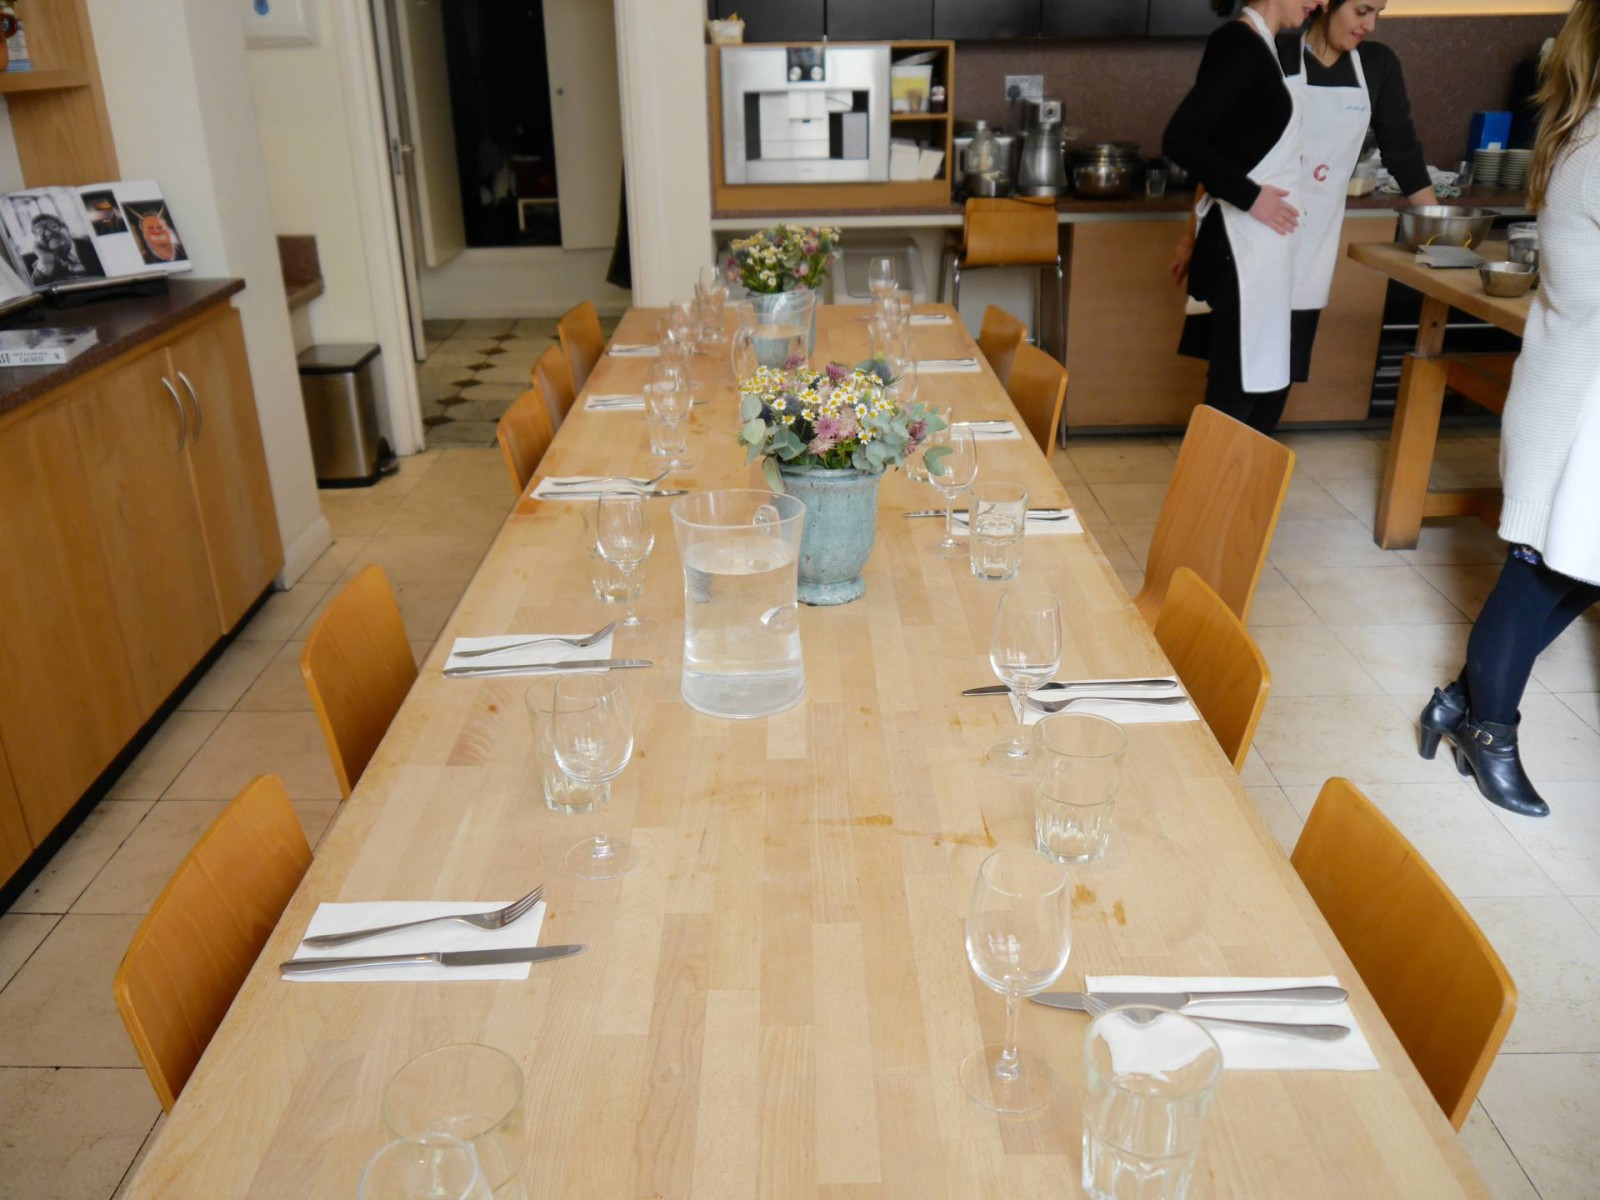 la-cucina-caldesi-cookery-school15